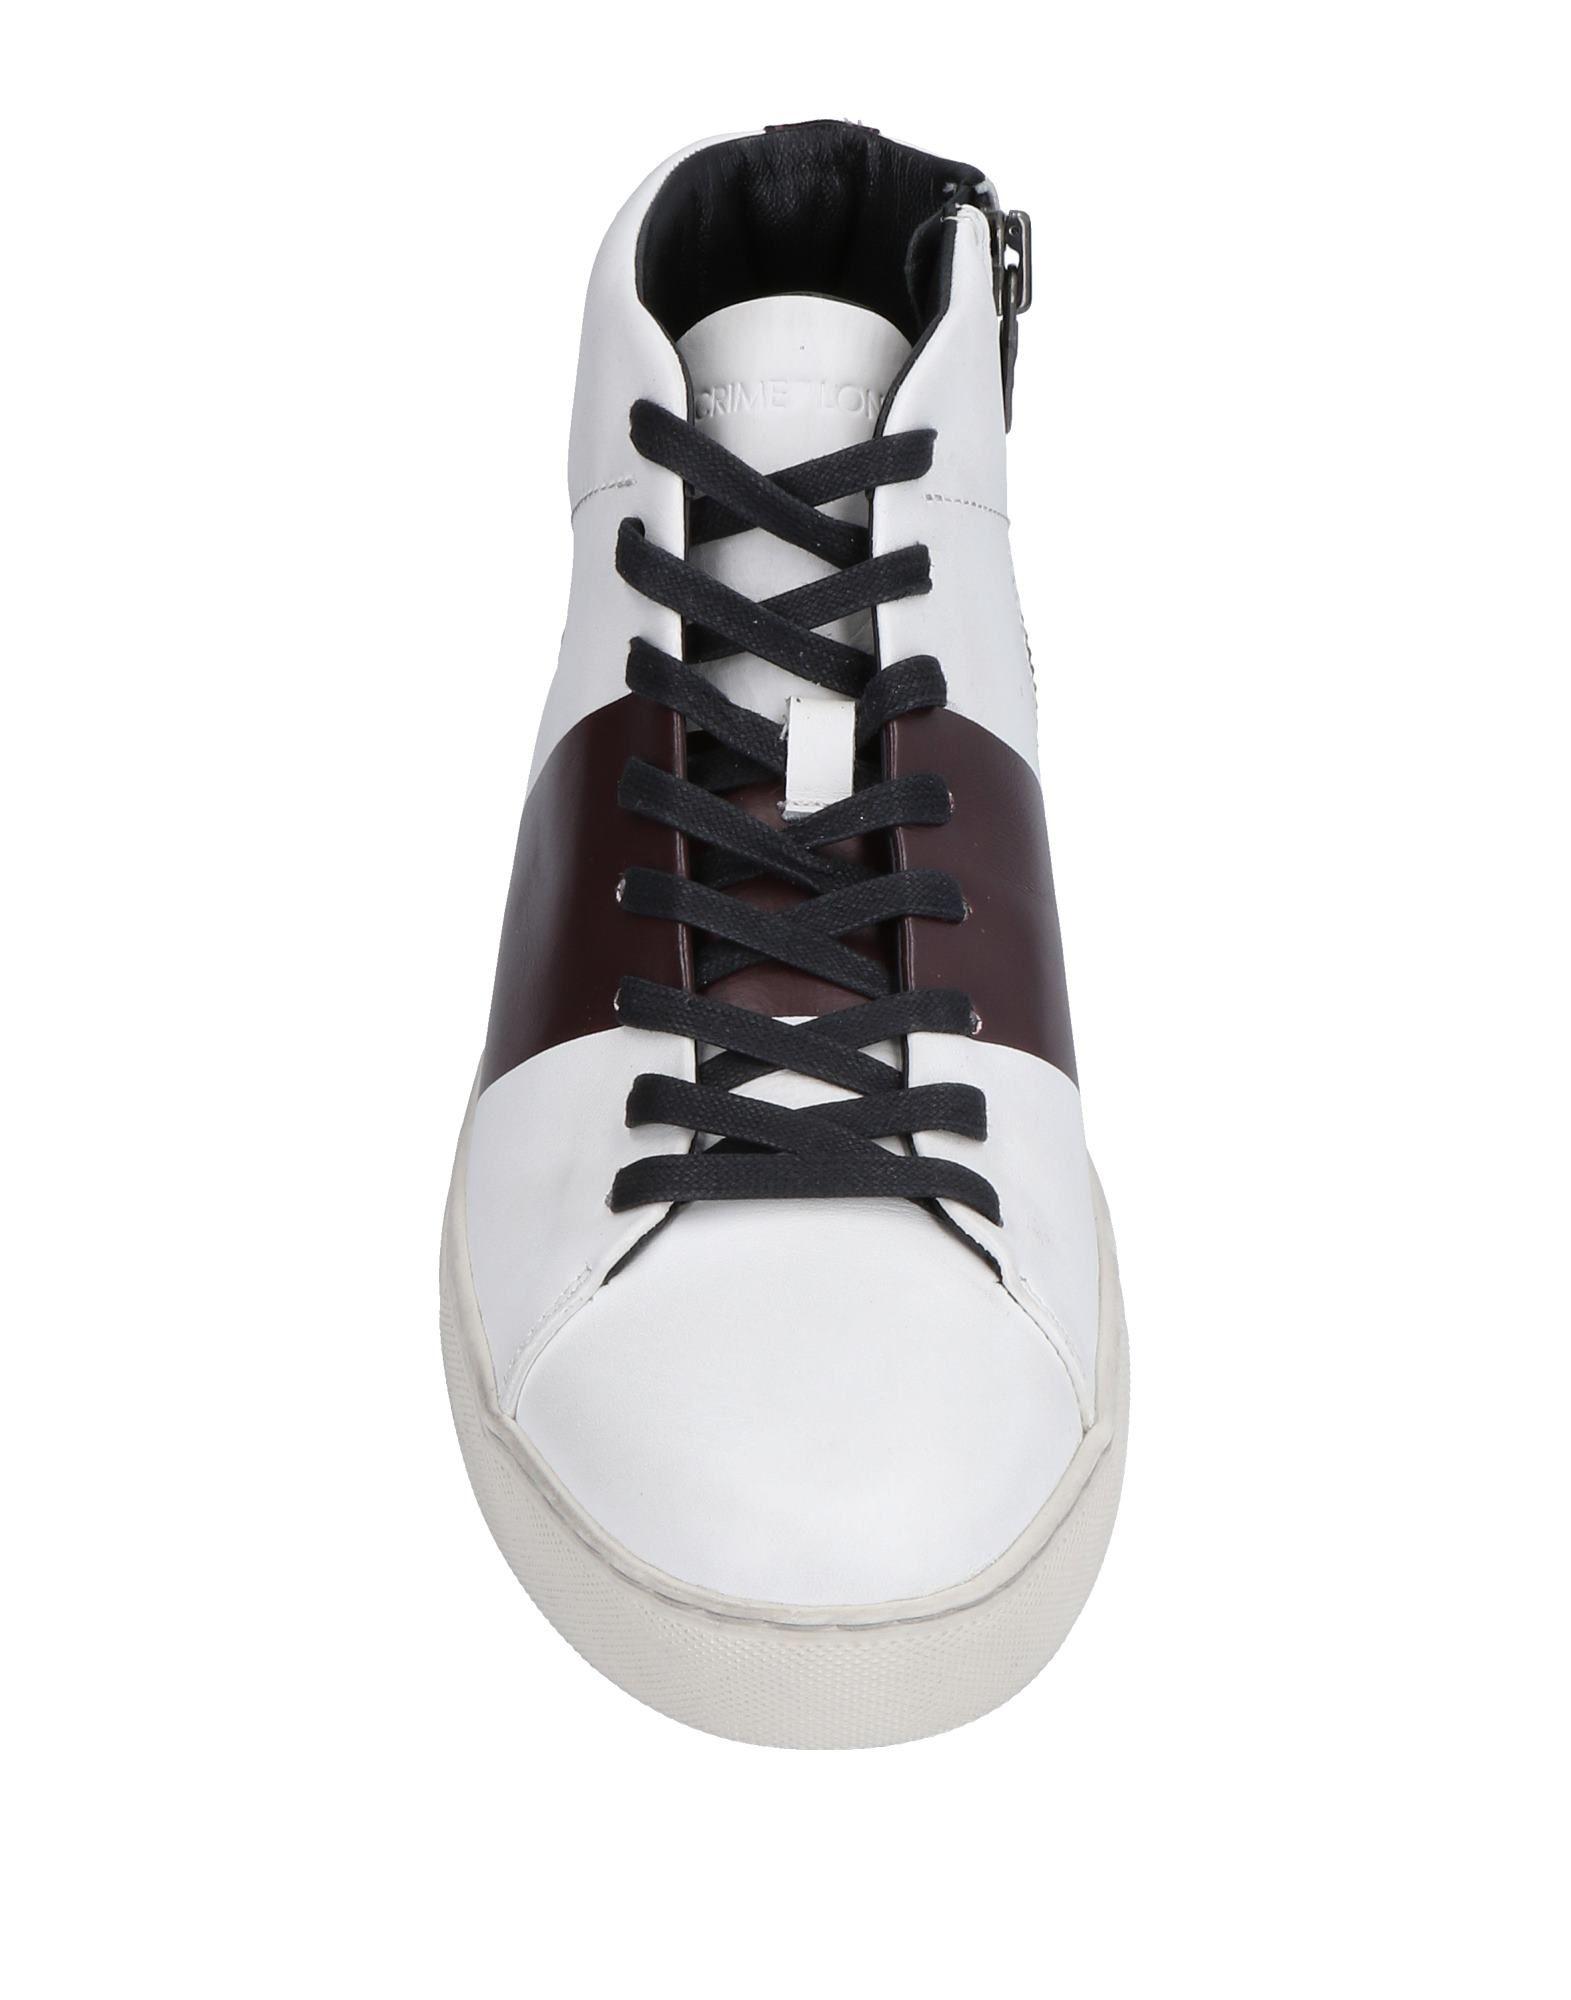 Rabatt echte Sneakers Schuhe Crime London Sneakers echte Herren  11519777OU 942feb